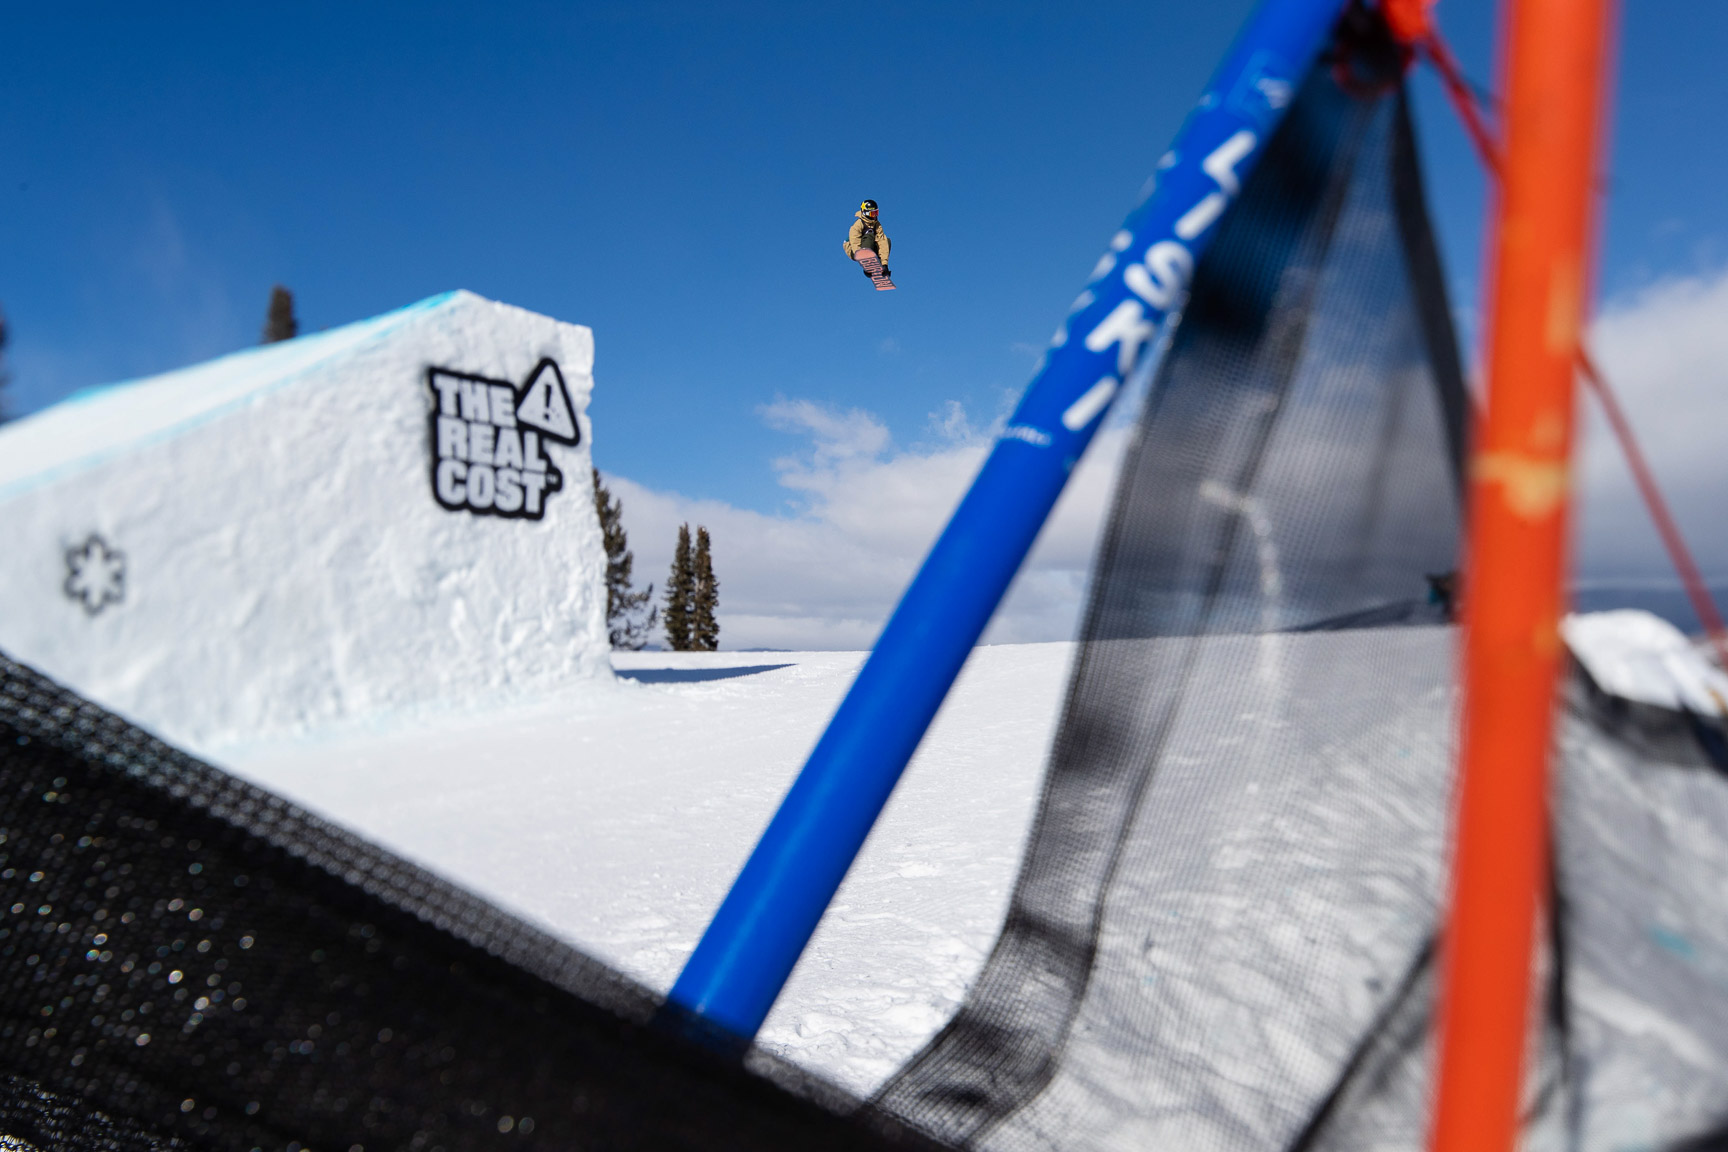 Mikey Ciccarelli, Men's Snowboard Slopestyle